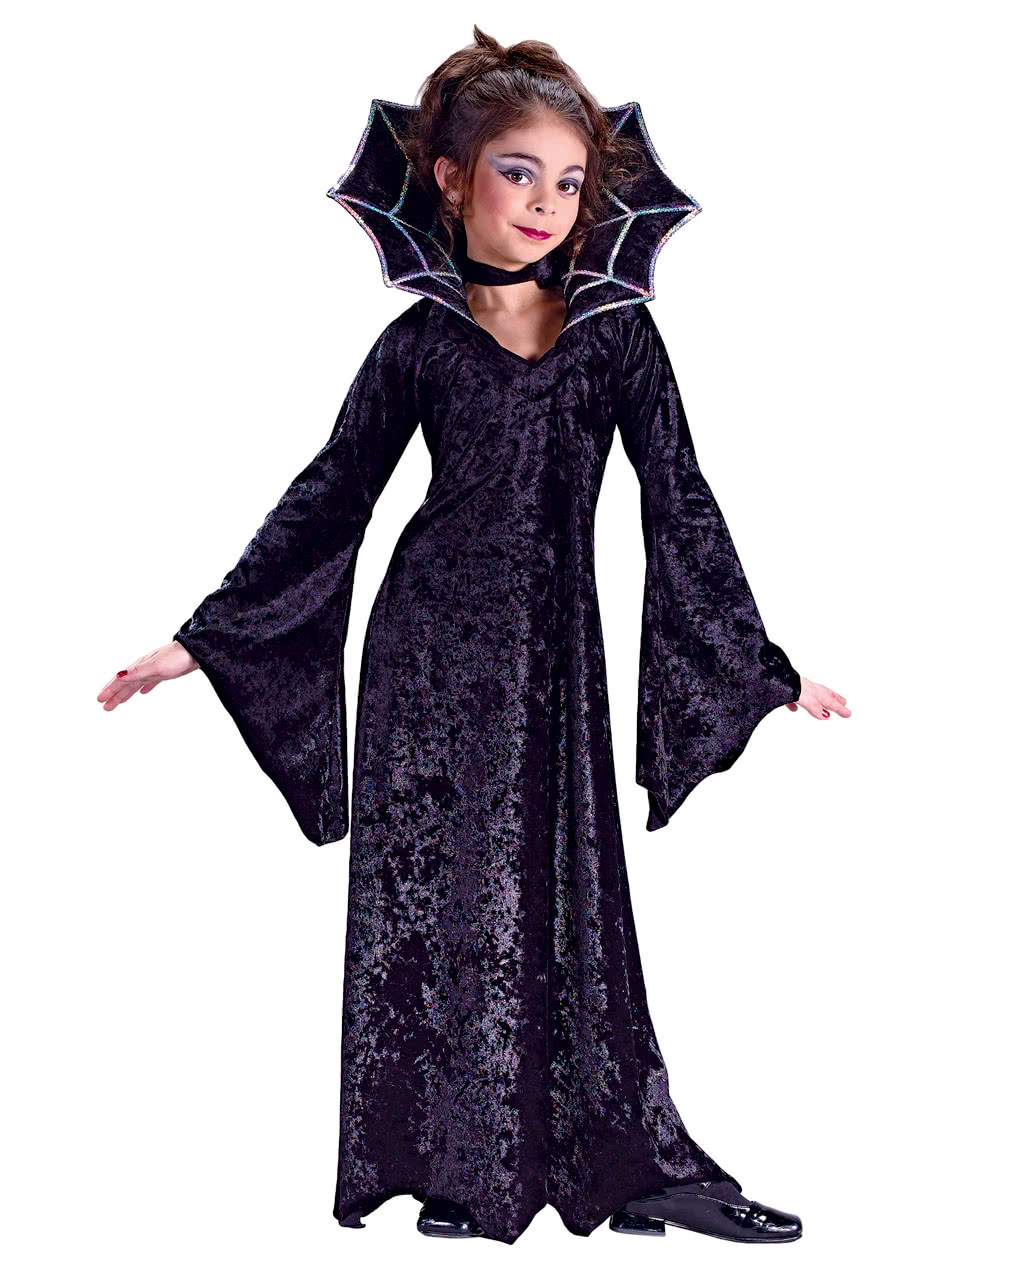 Spider V&ire Princess Child Costume Small | Halloween Costume | horror-shop.com  sc 1 st  Horror-Shop.com & Spider Vampire Princess Child Costume Small | Halloween Costume ...